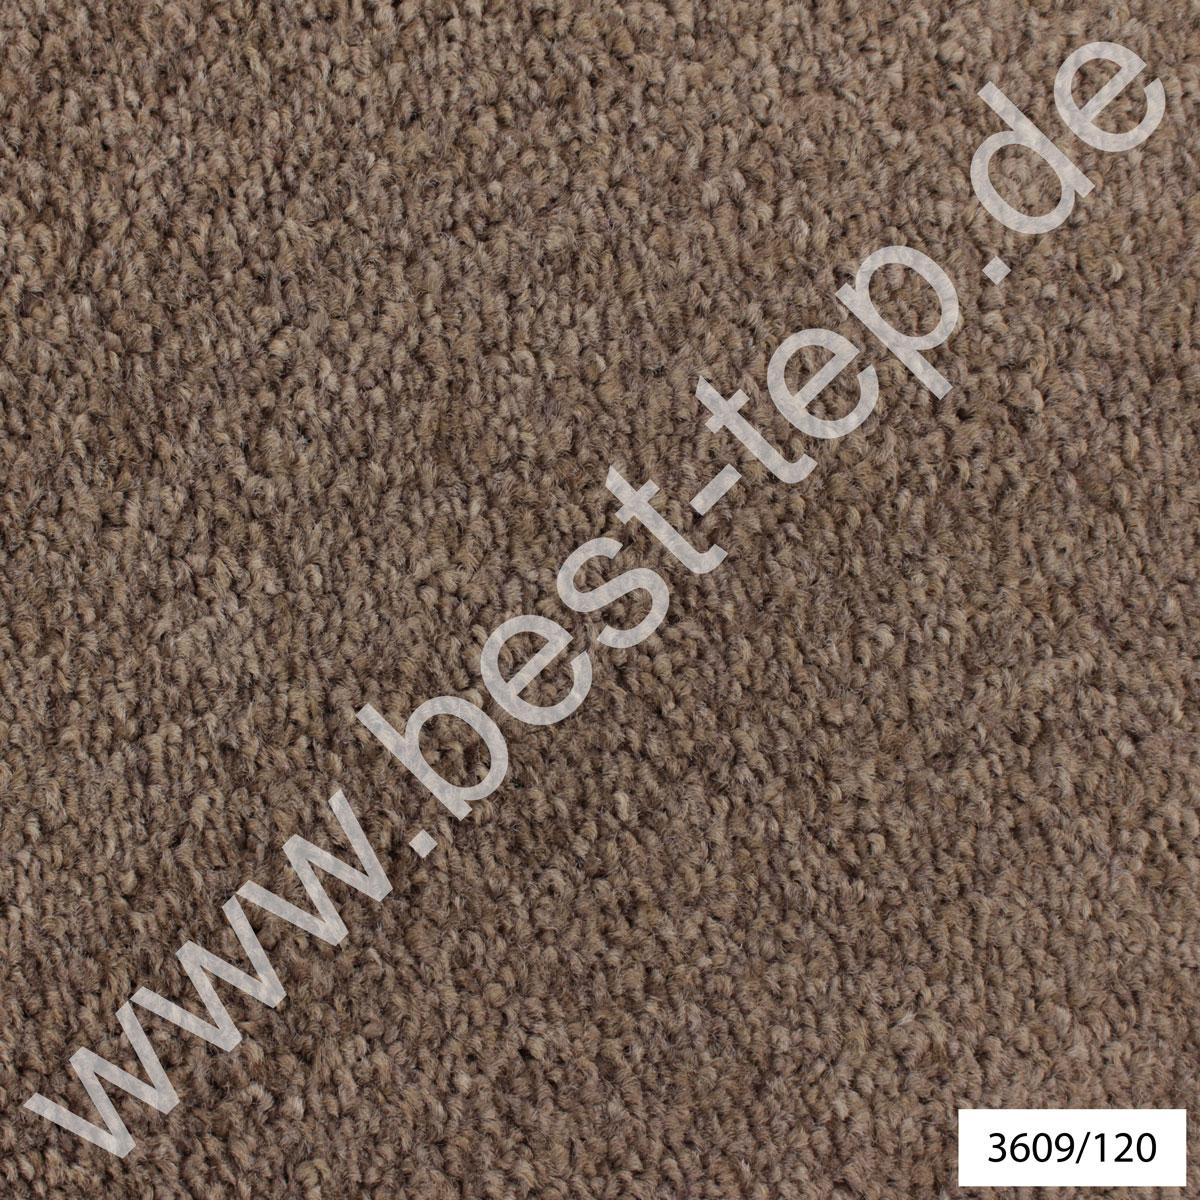 jab anstoetz shop jab anstoetz noblesse flair teppich 3609 120 online kaufen. Black Bedroom Furniture Sets. Home Design Ideas